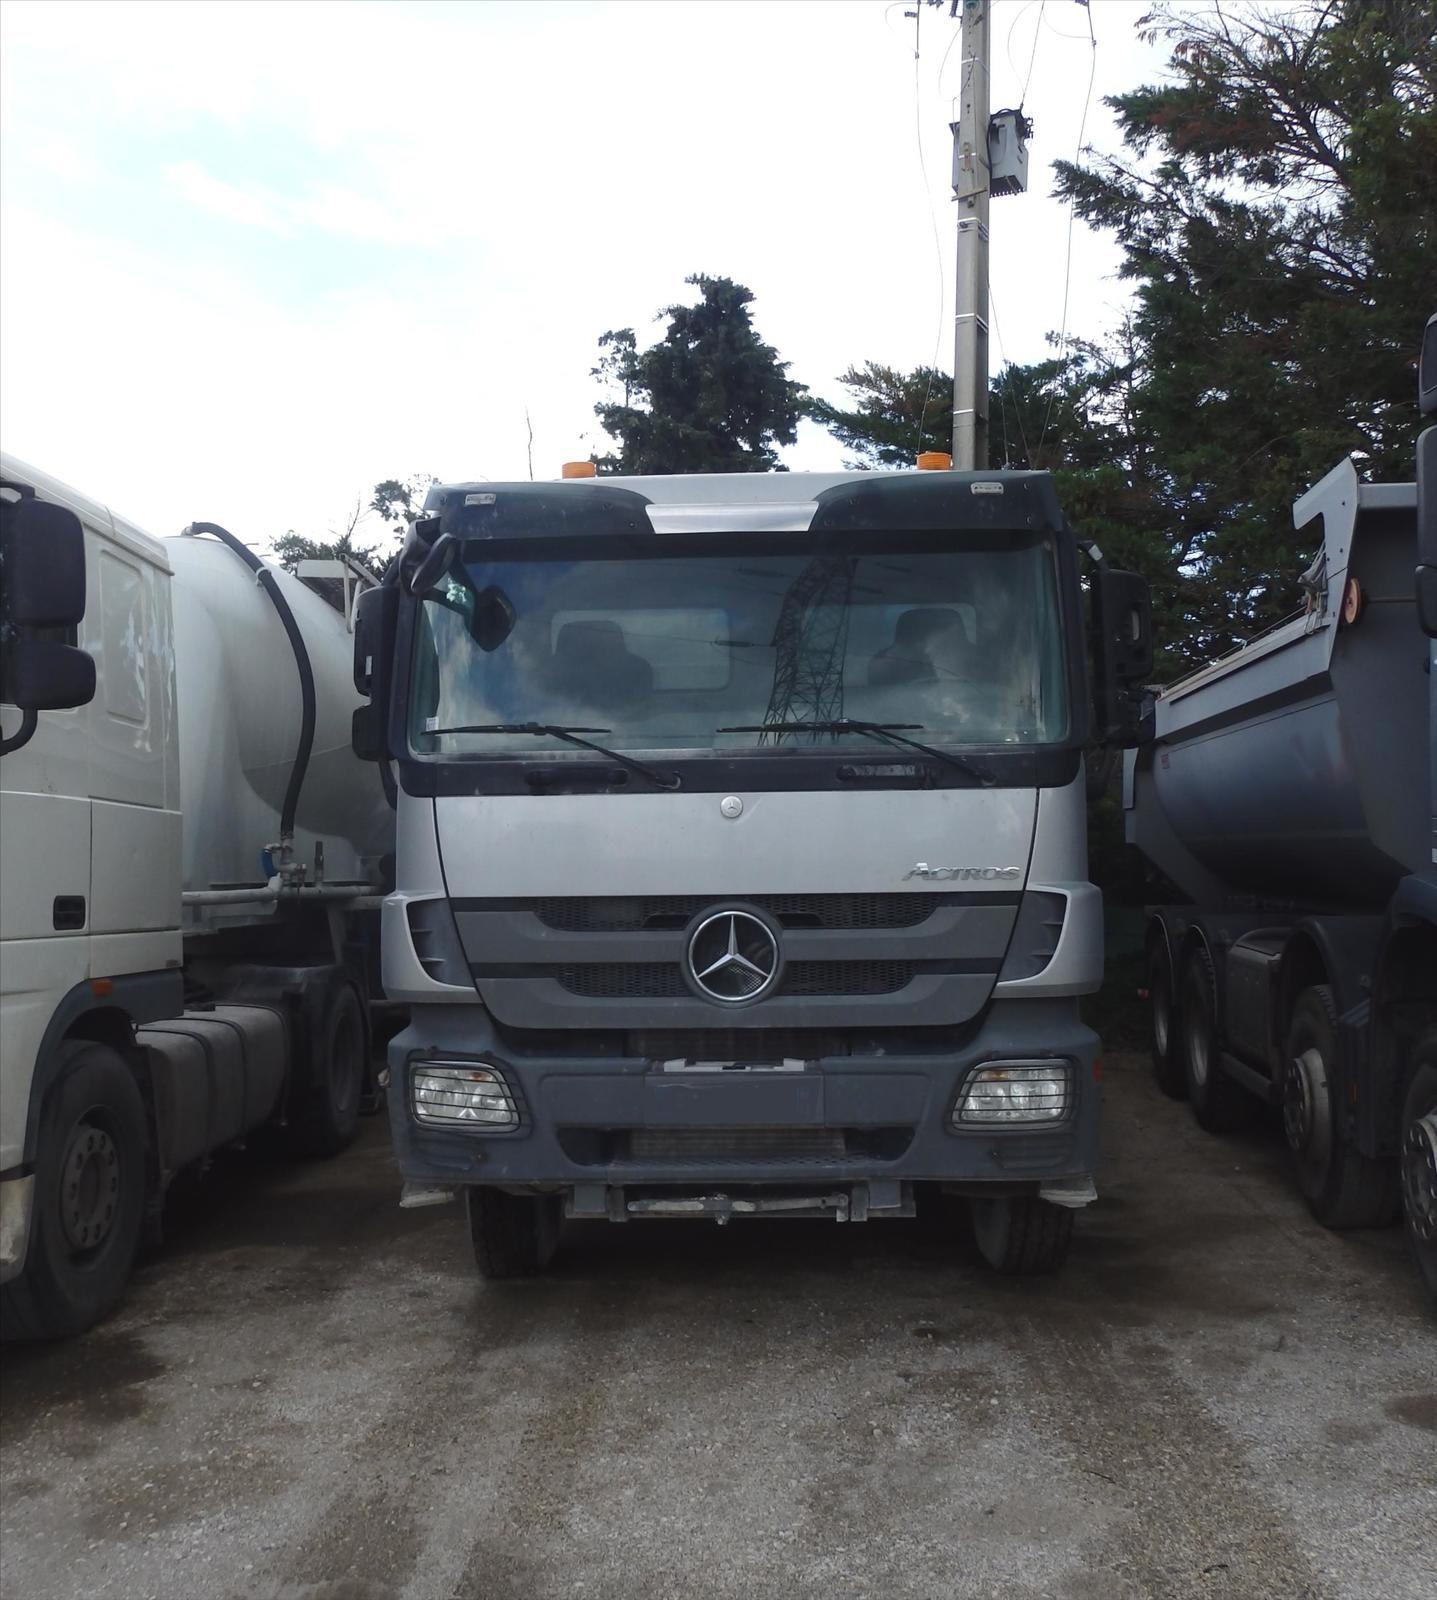 Camion MERCEDES ACTROS 32-41 8x4 Pierre BASSAT Tel: 0608066192 TRANSCOMM13